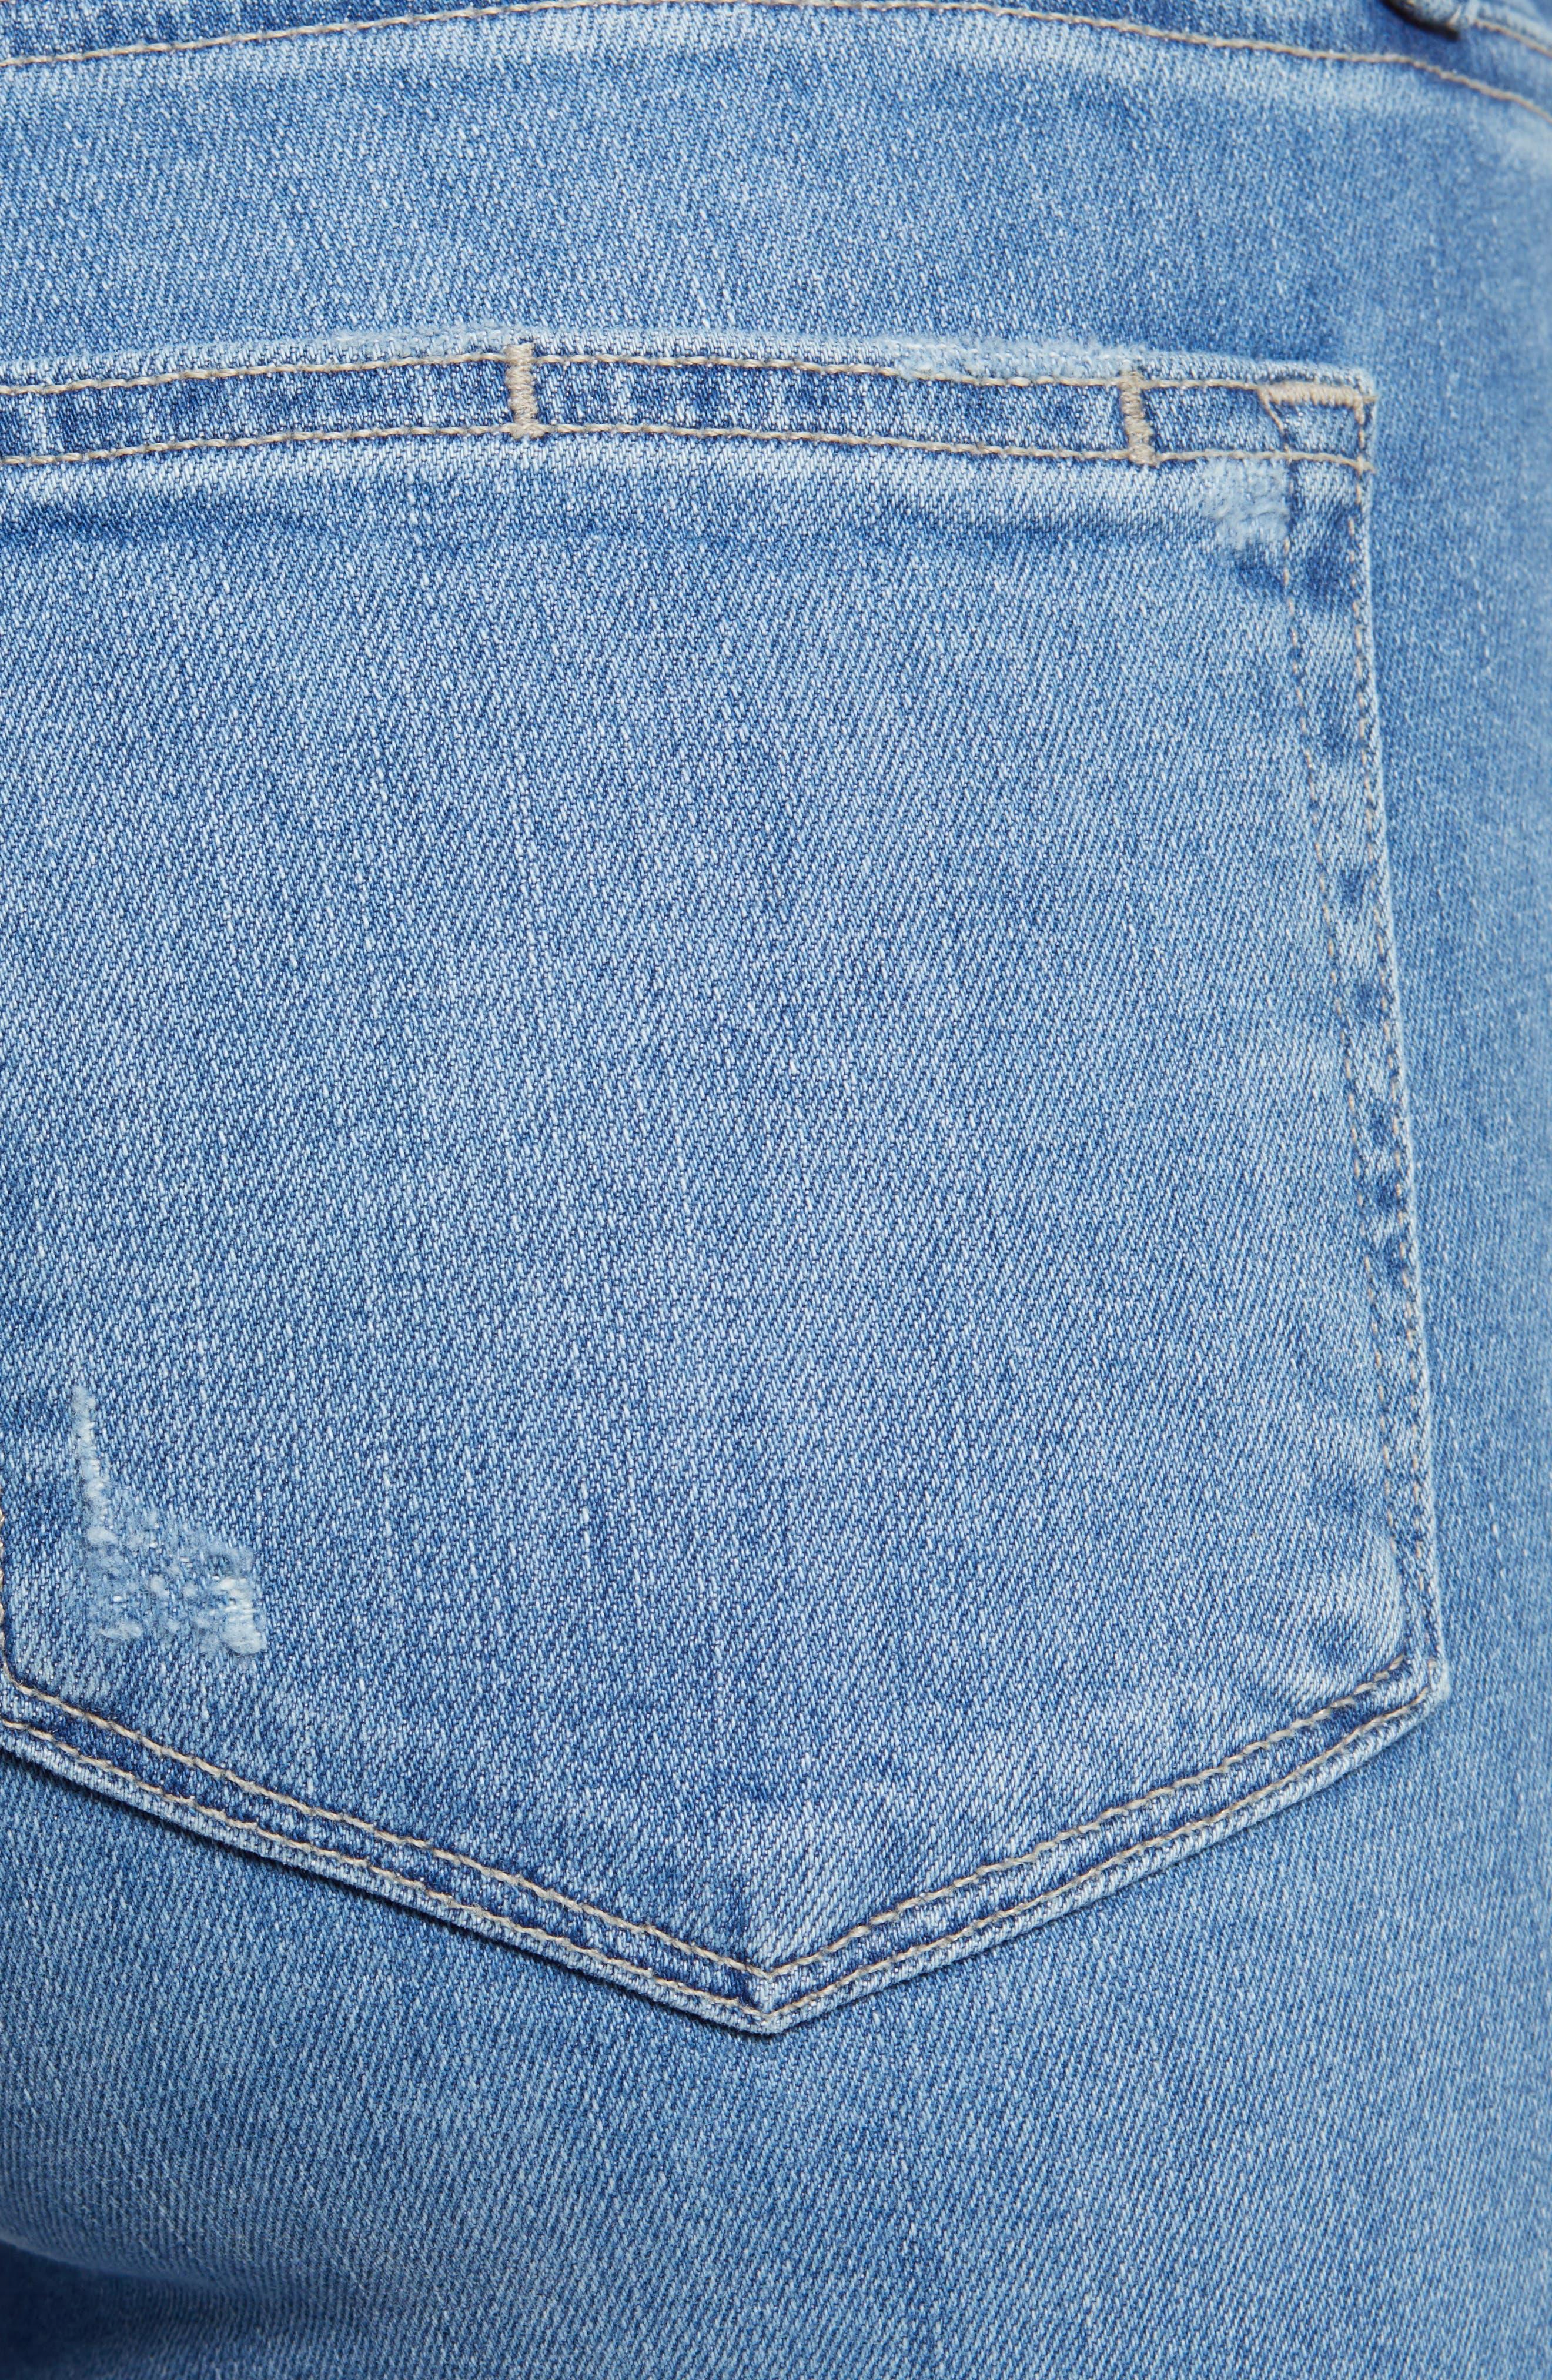 ,                             Transcend Vintage - Hoxton High Waist Ankle Skinny Jeans,                             Alternate thumbnail 6, color,                             400